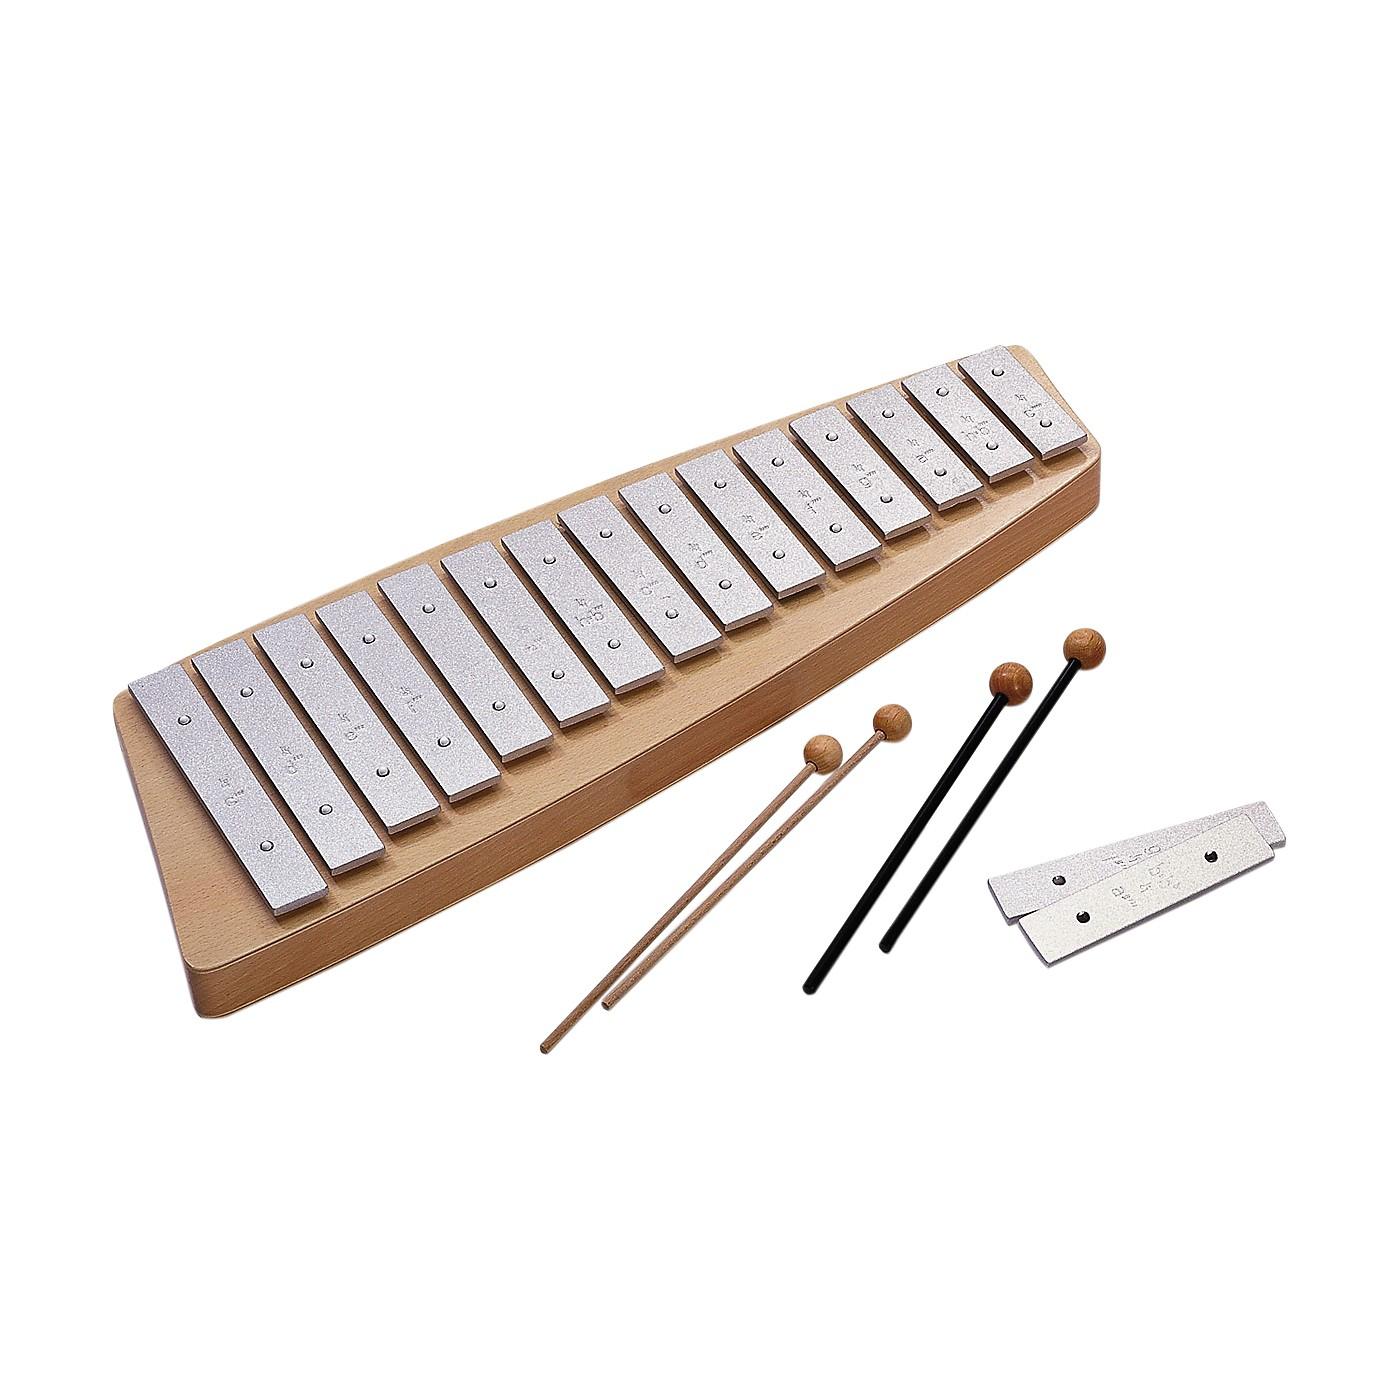 Sonor Orff Meisterklasse Soprano Glockenspiels thumbnail